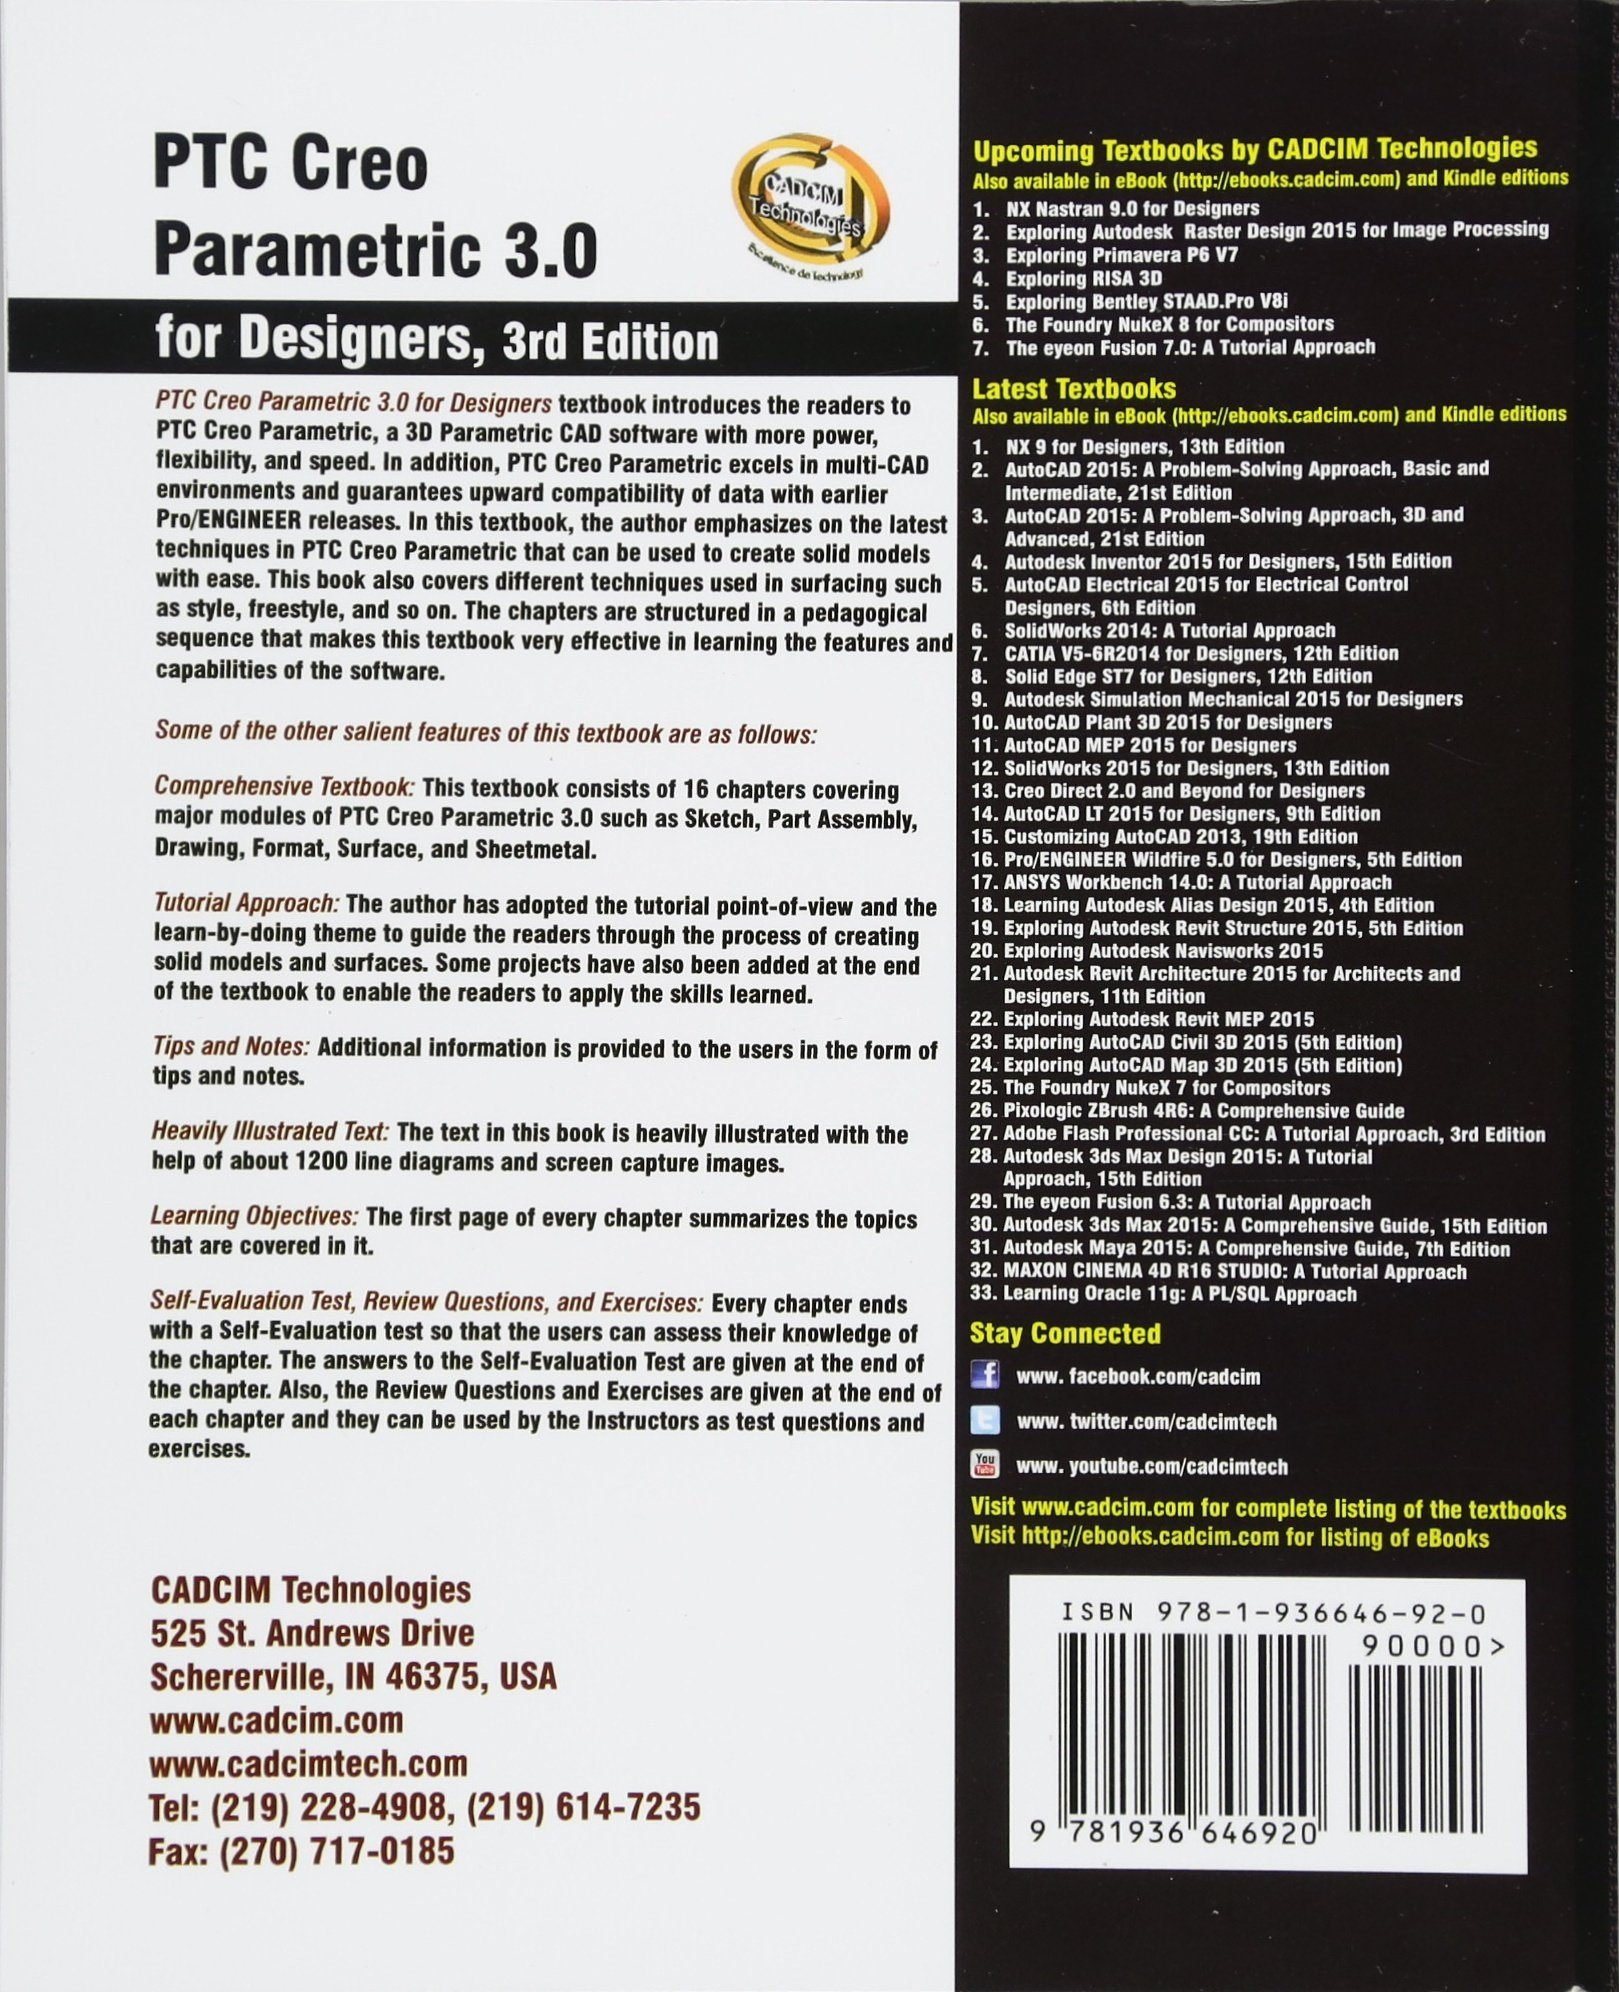 PTC Creo Parametric 30 For Designers Prof Sham Tickoo Purdue Univ Cadcim Technologies 9781936646920 Amazon Books